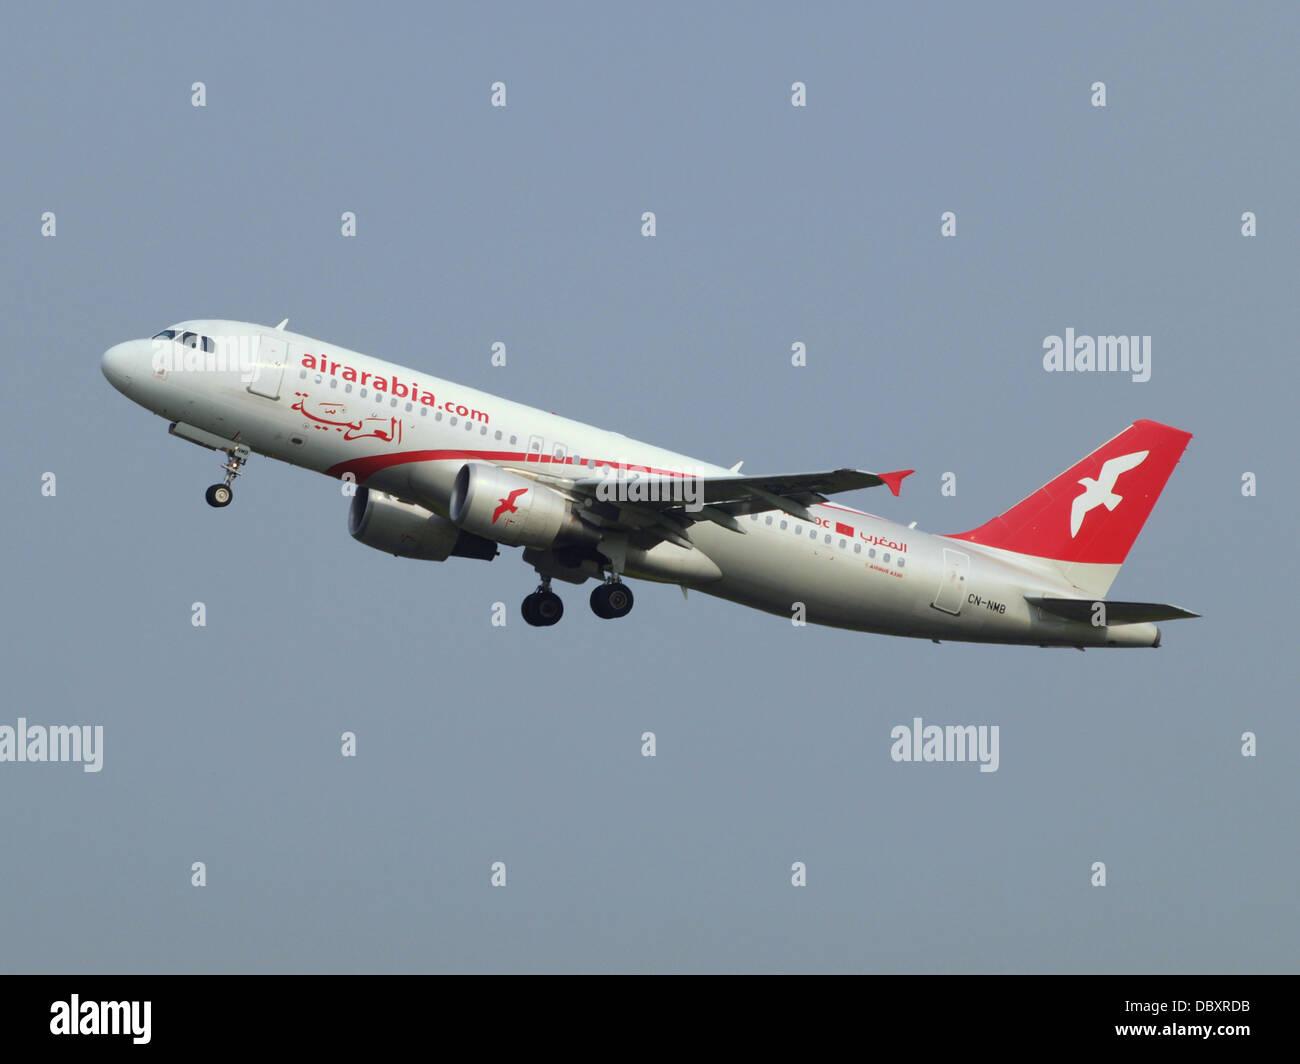 CN-NMB Air Arabia Maroc Airbus A320-214 - cn 3833 take-off 14july2013 2 - Stock Image